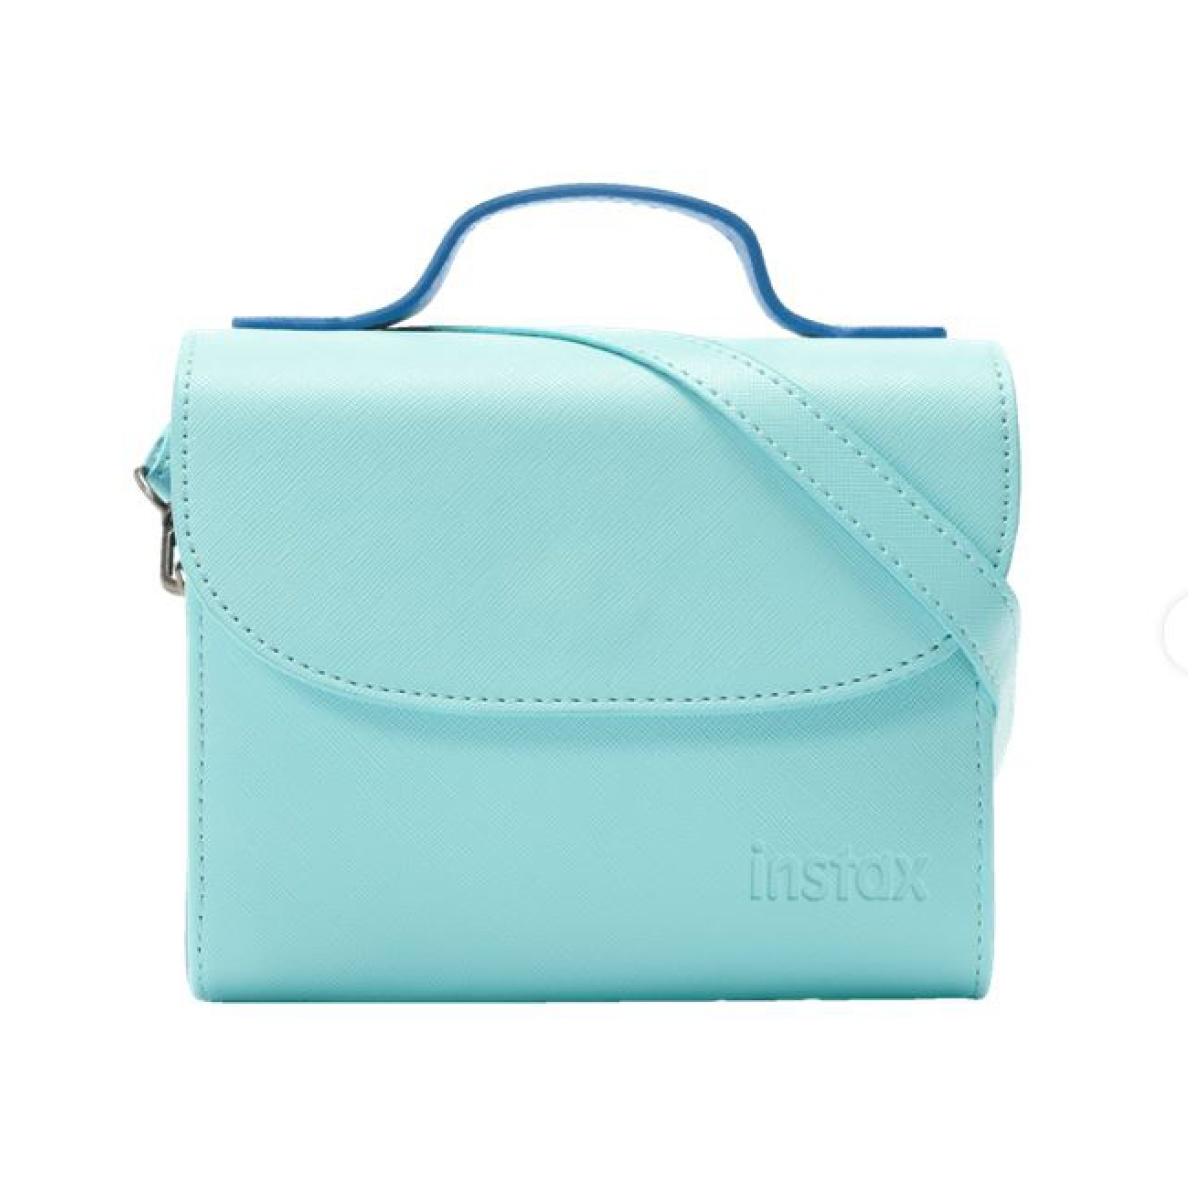 Fujifilm Instax Mini 9 Tasche eisblau